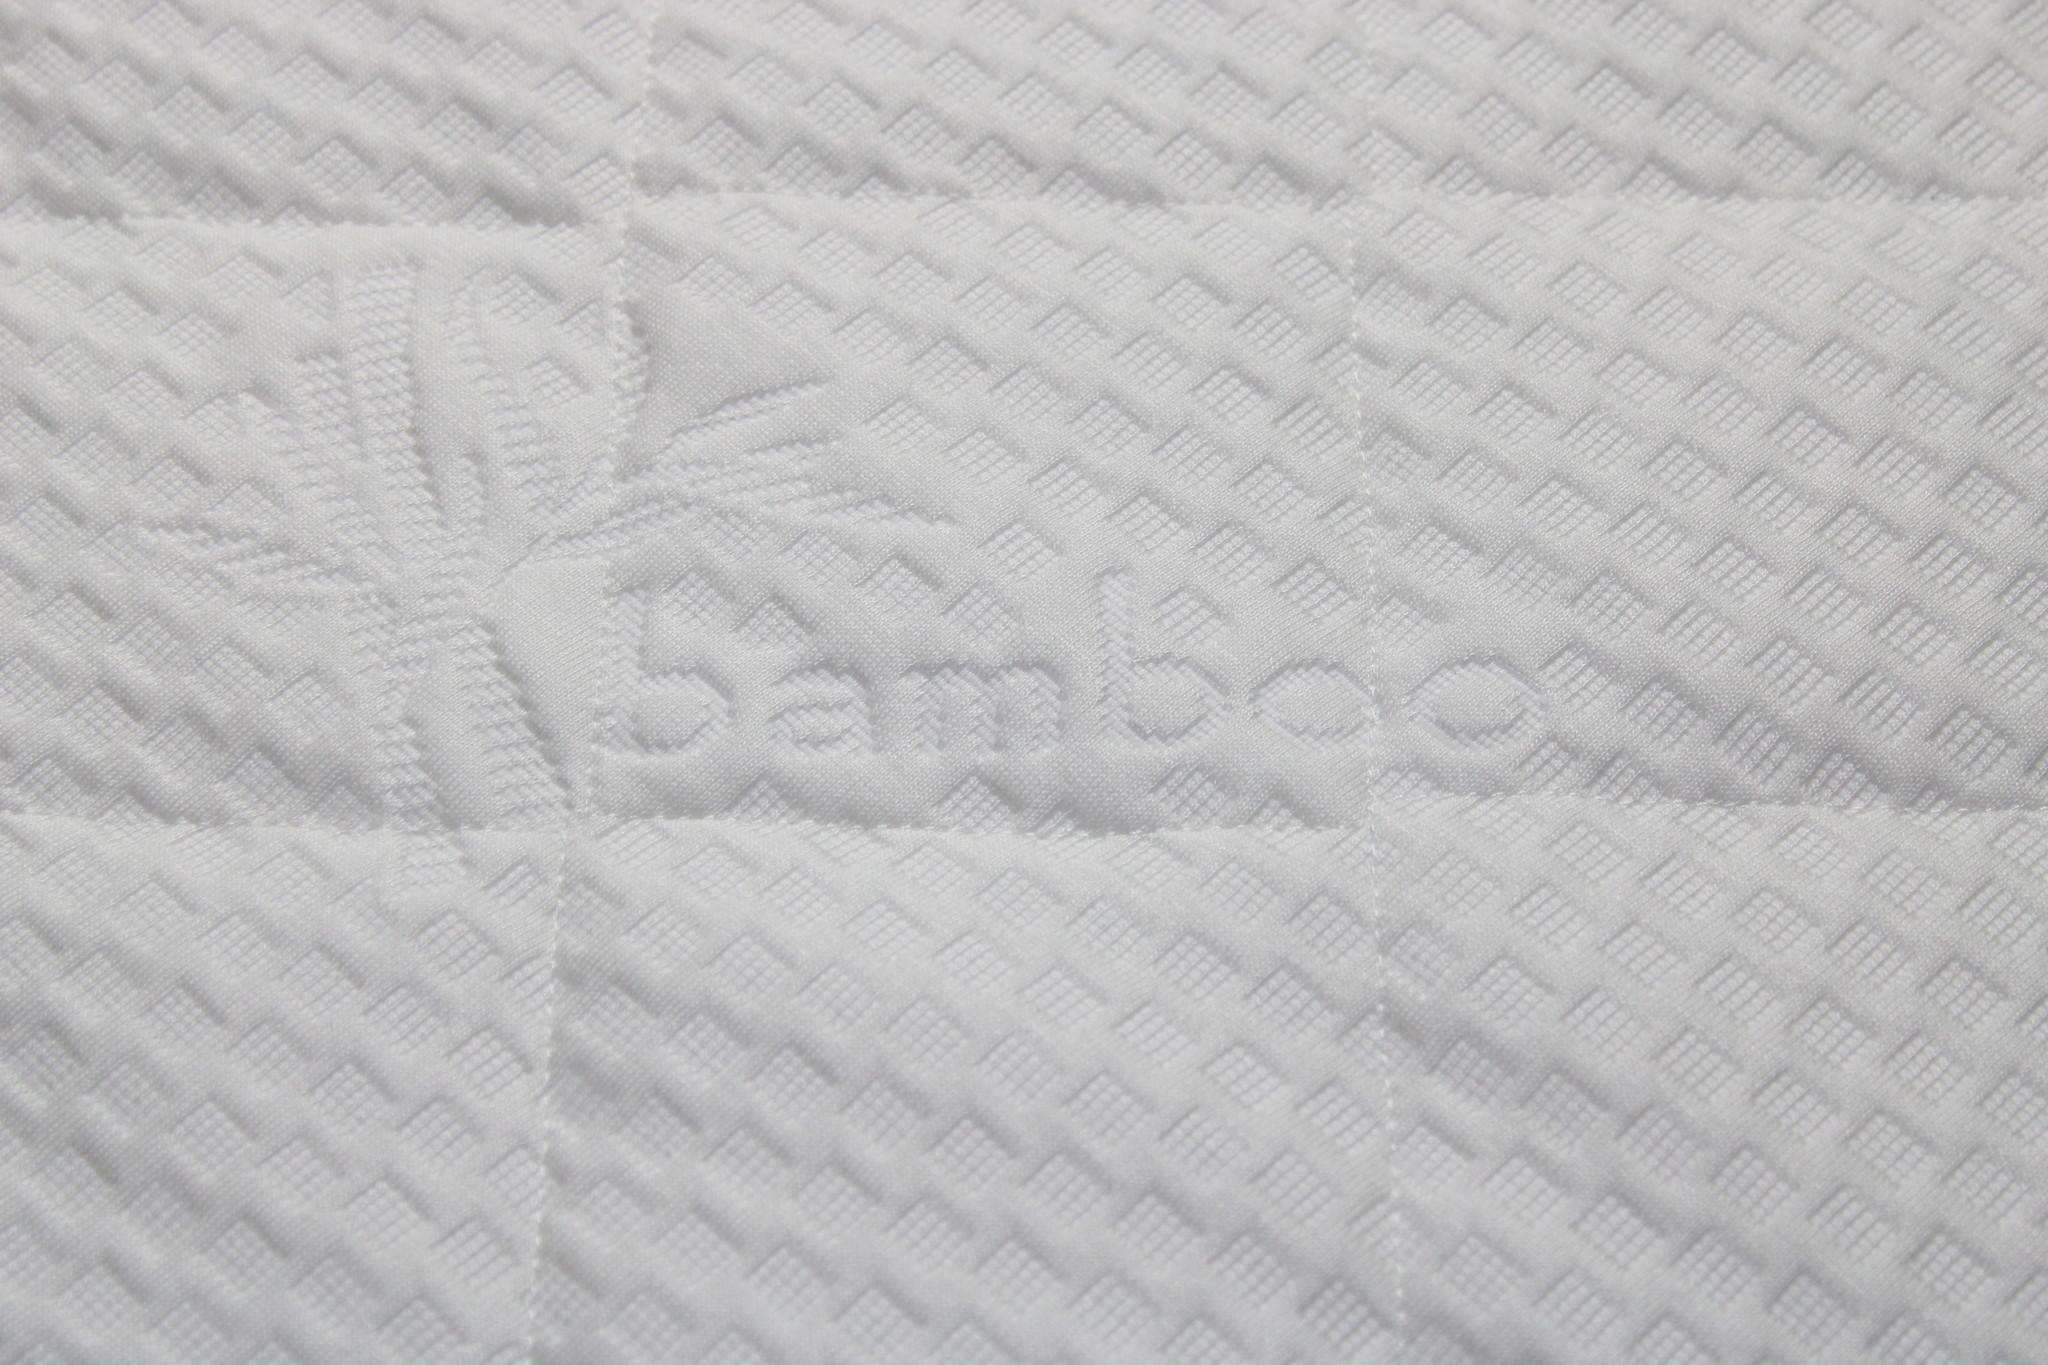 Sarpy Kindermatras 90x175 koudschuim hr40 bamboo